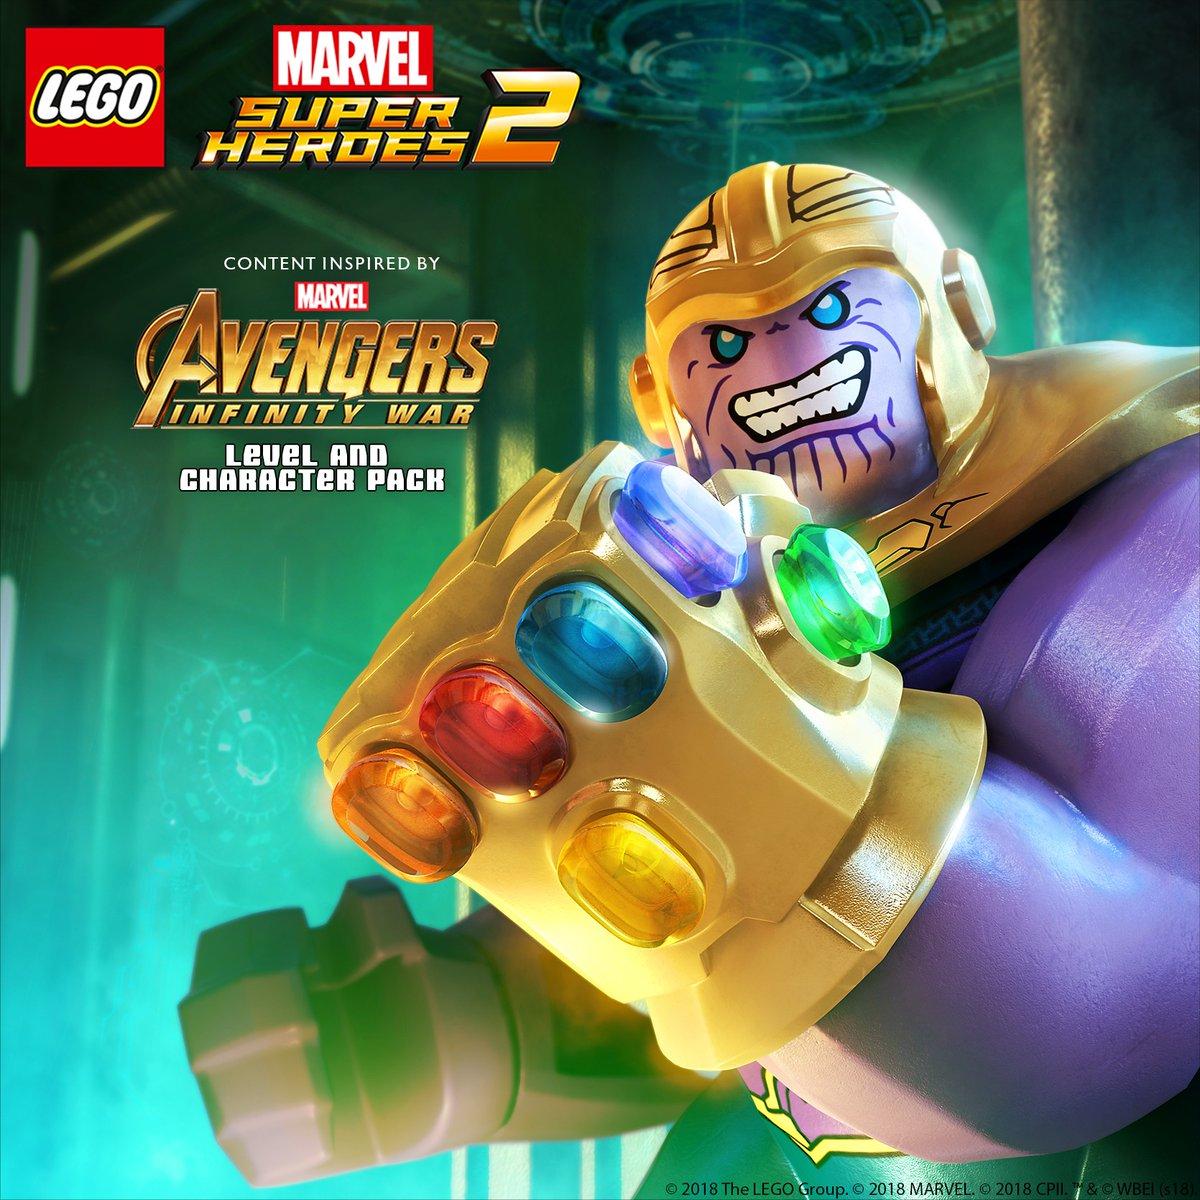 Lego Marvel Super Heroes 2 Avengers Infinity War Dlc Footage